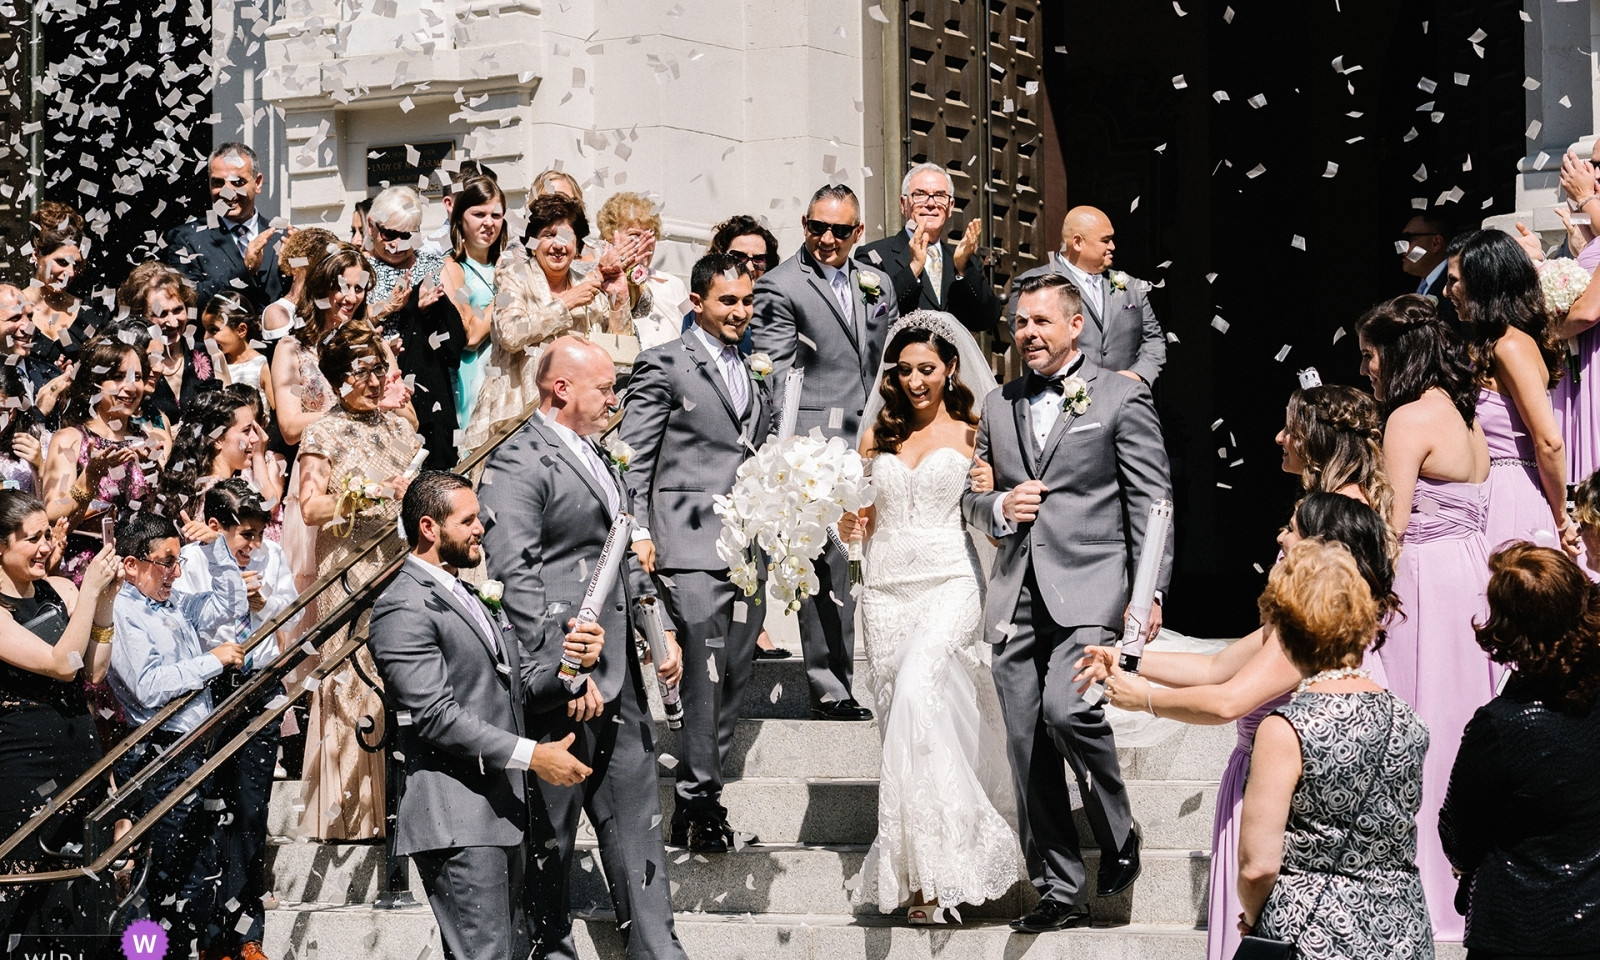 wedding-photographer-2451766.jpg